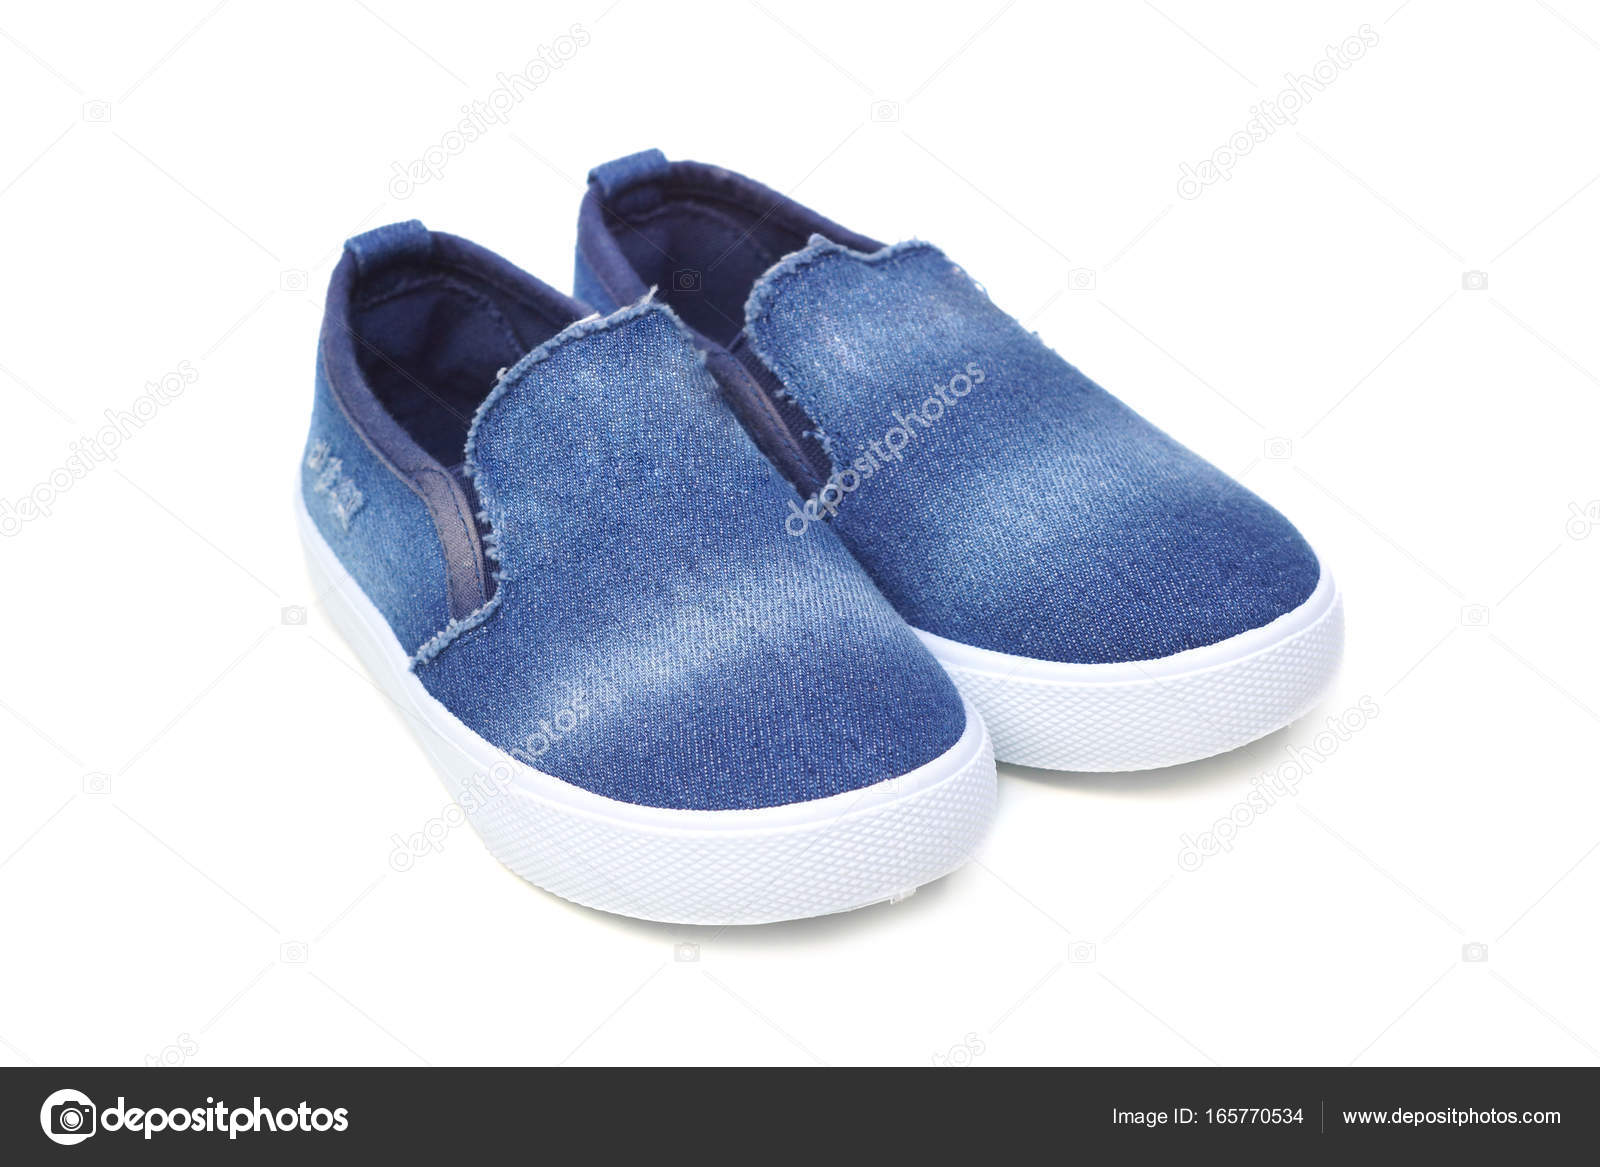 639b54e19a3 Ζαν τζιν παντοφλέ παπούτσια — Φωτογραφία Αρχείου © weerapat #165770534